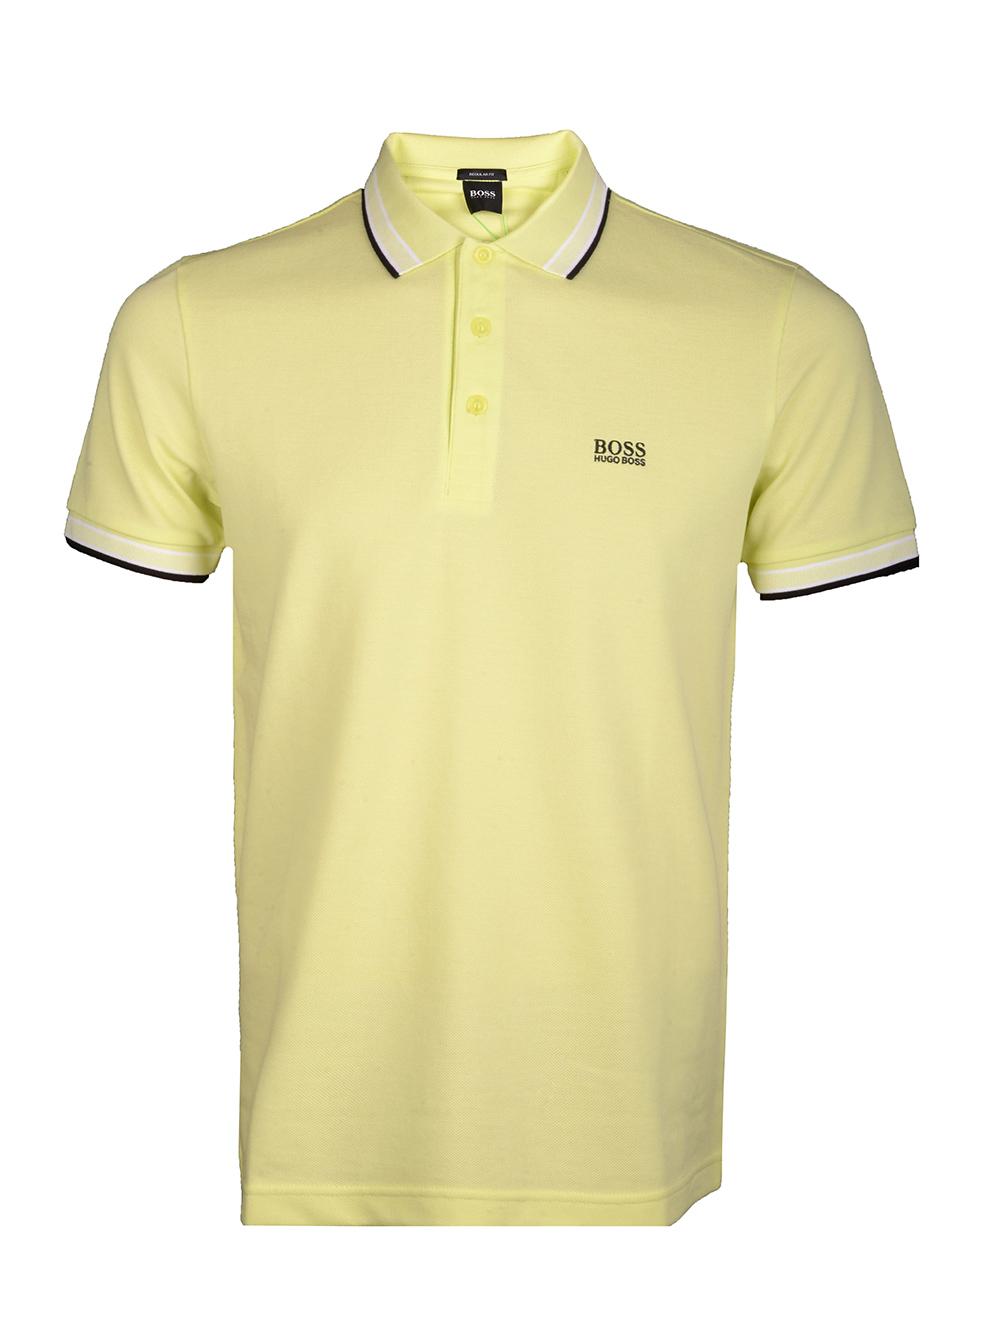 BOSS Μπλούζα Polo 50398302-337 ΛΑΧΑΝΙ